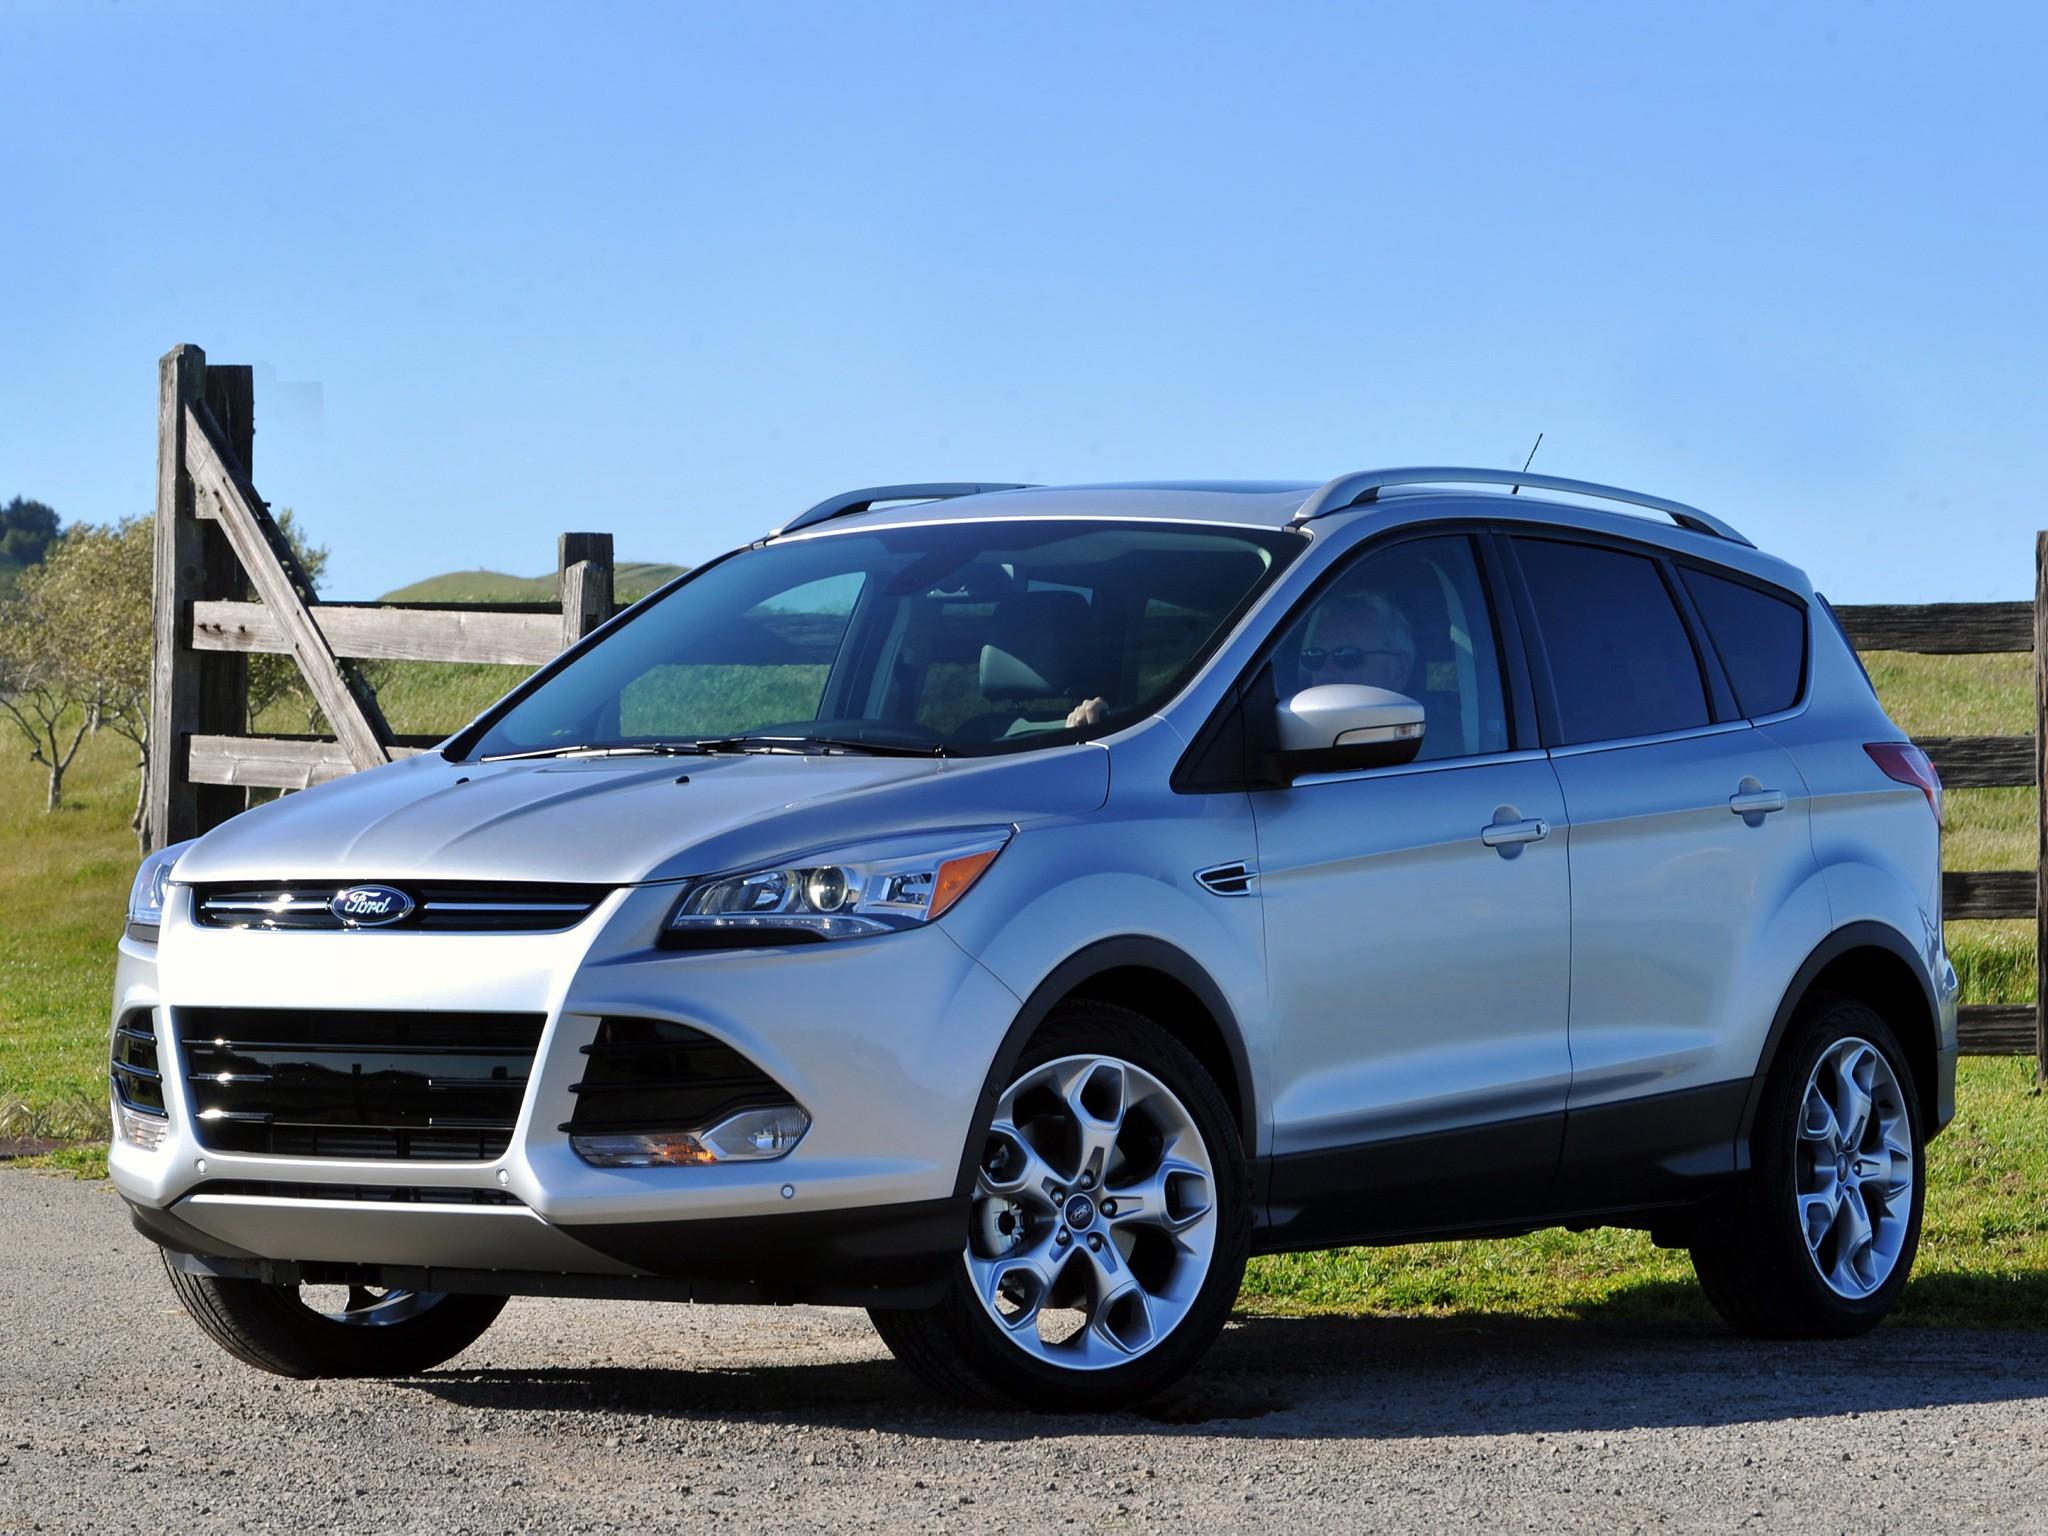 2013 Ford Escape Value >> FORD Escape specs & photos - 2012, 2013, 2014, 2015, 2016 ...